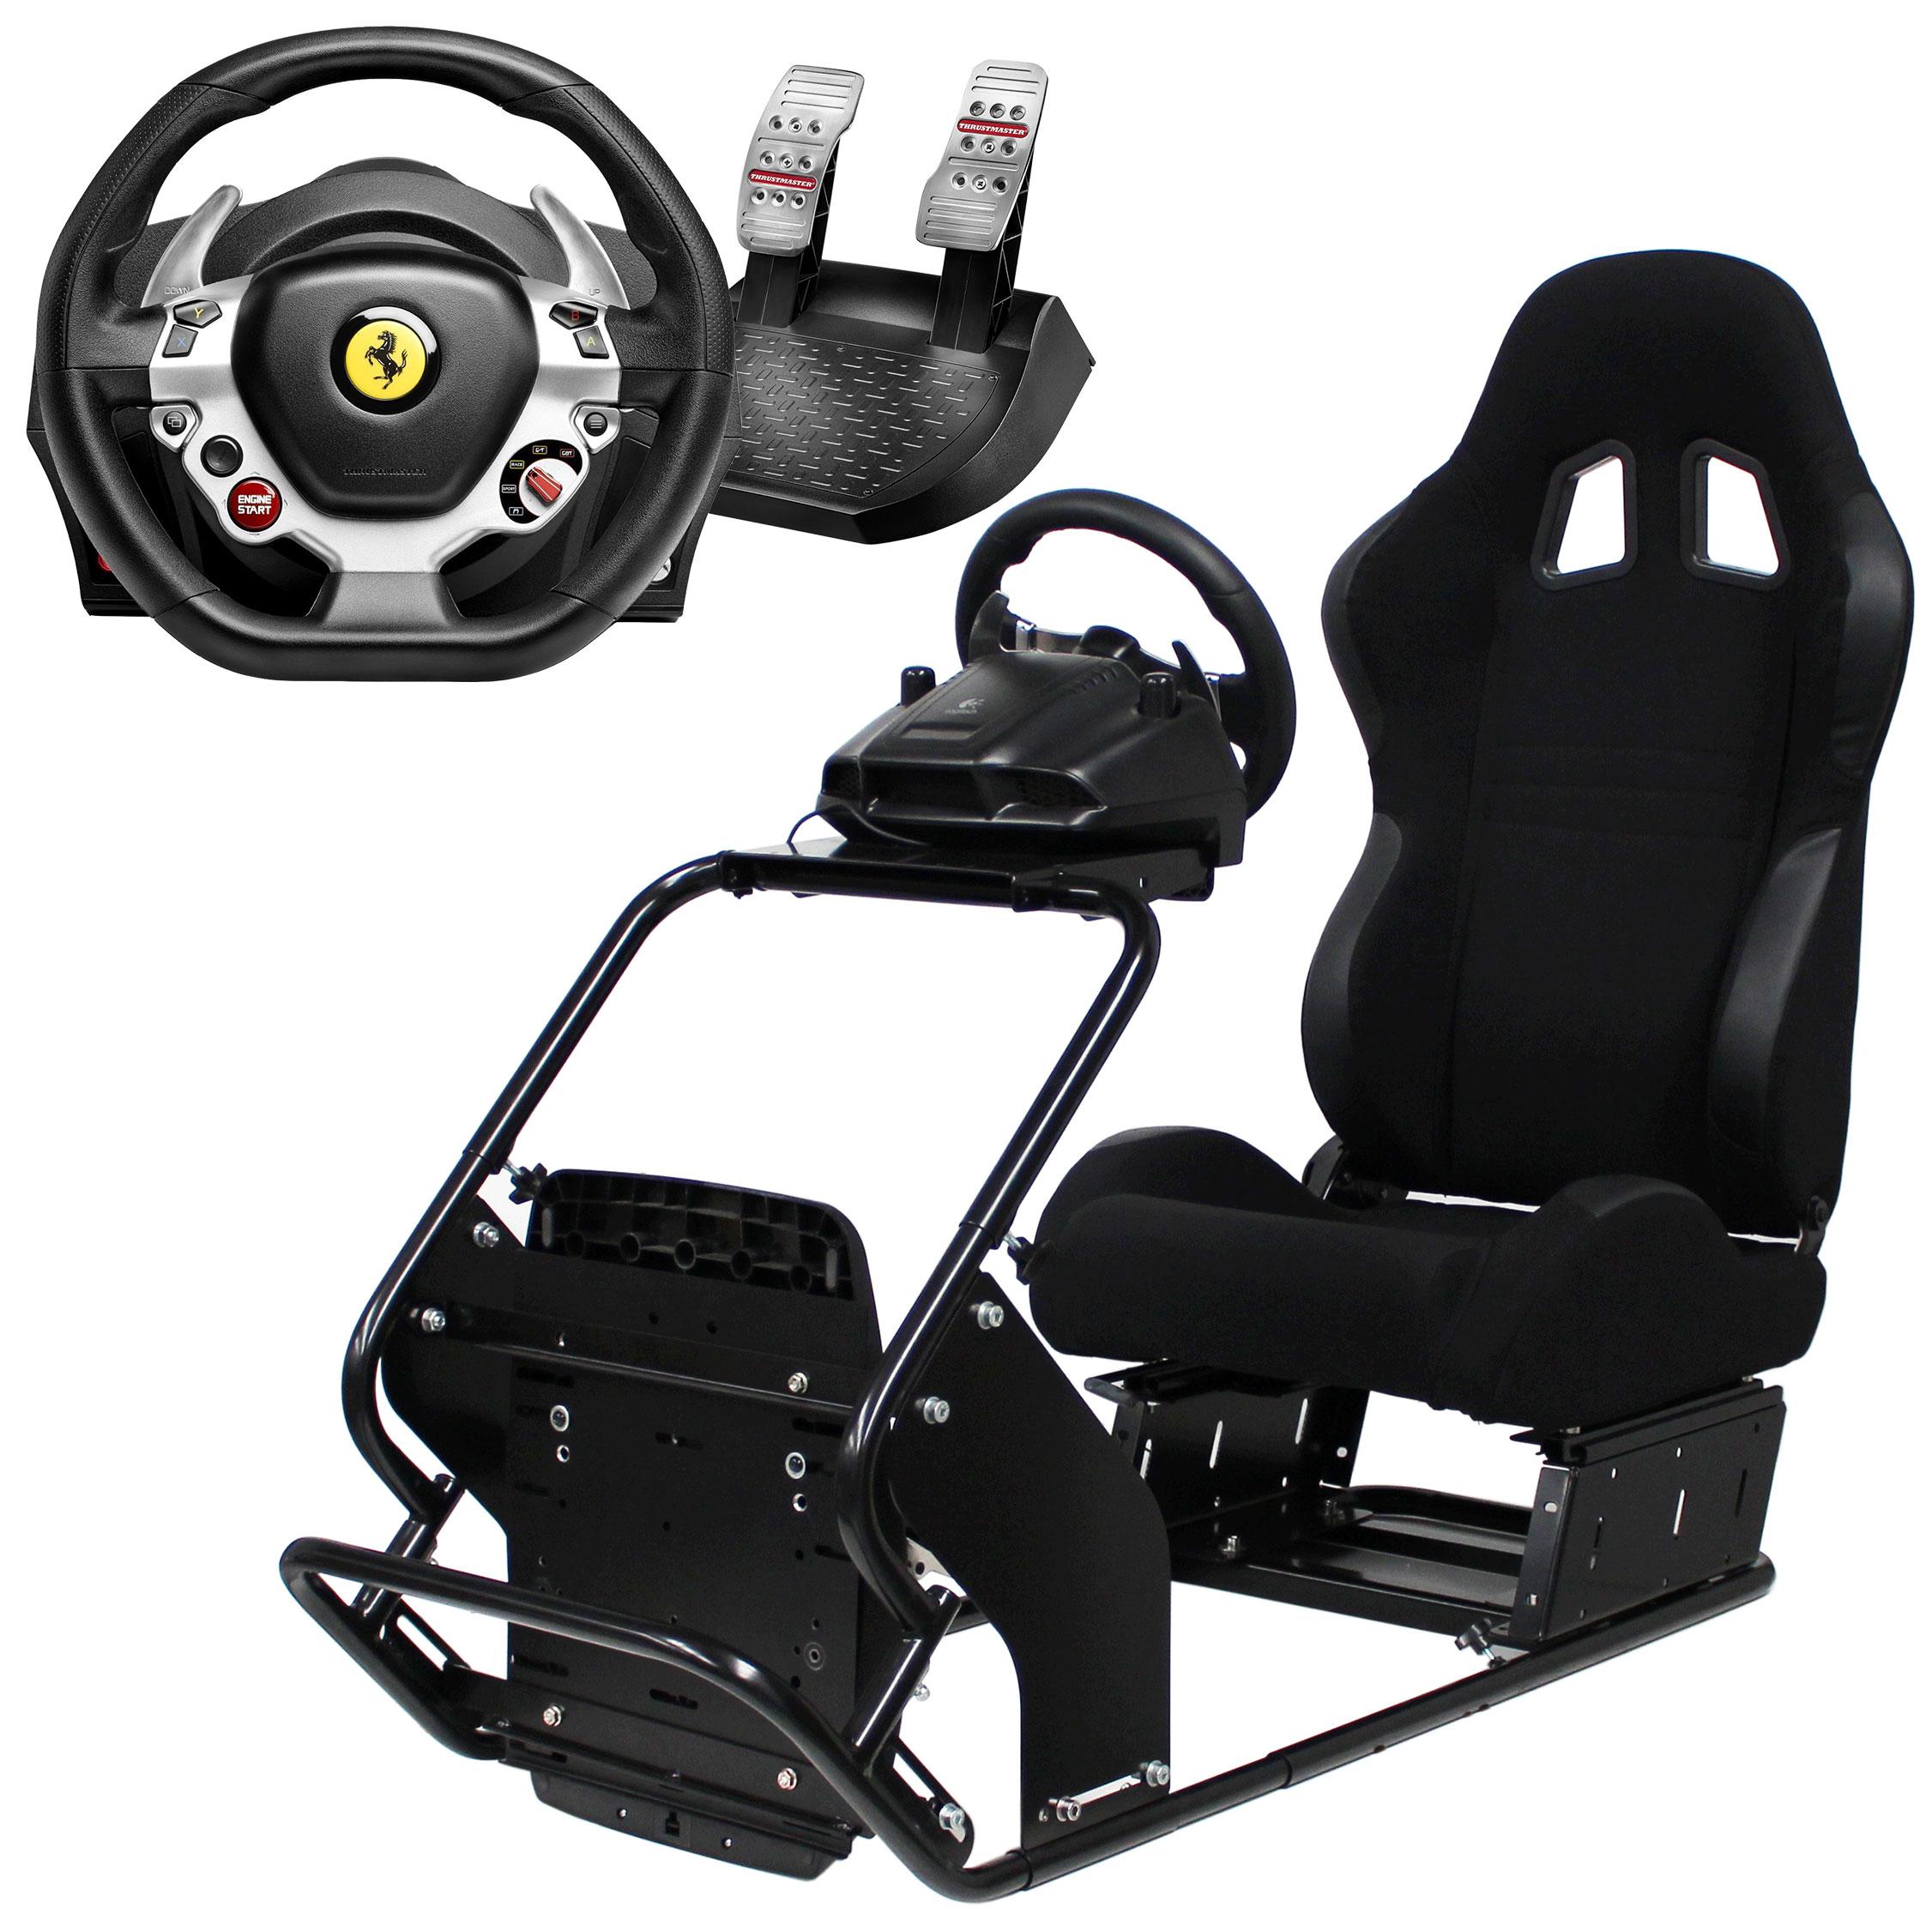 RACE SIM D-RS 0001-S1 & TX WHEEL